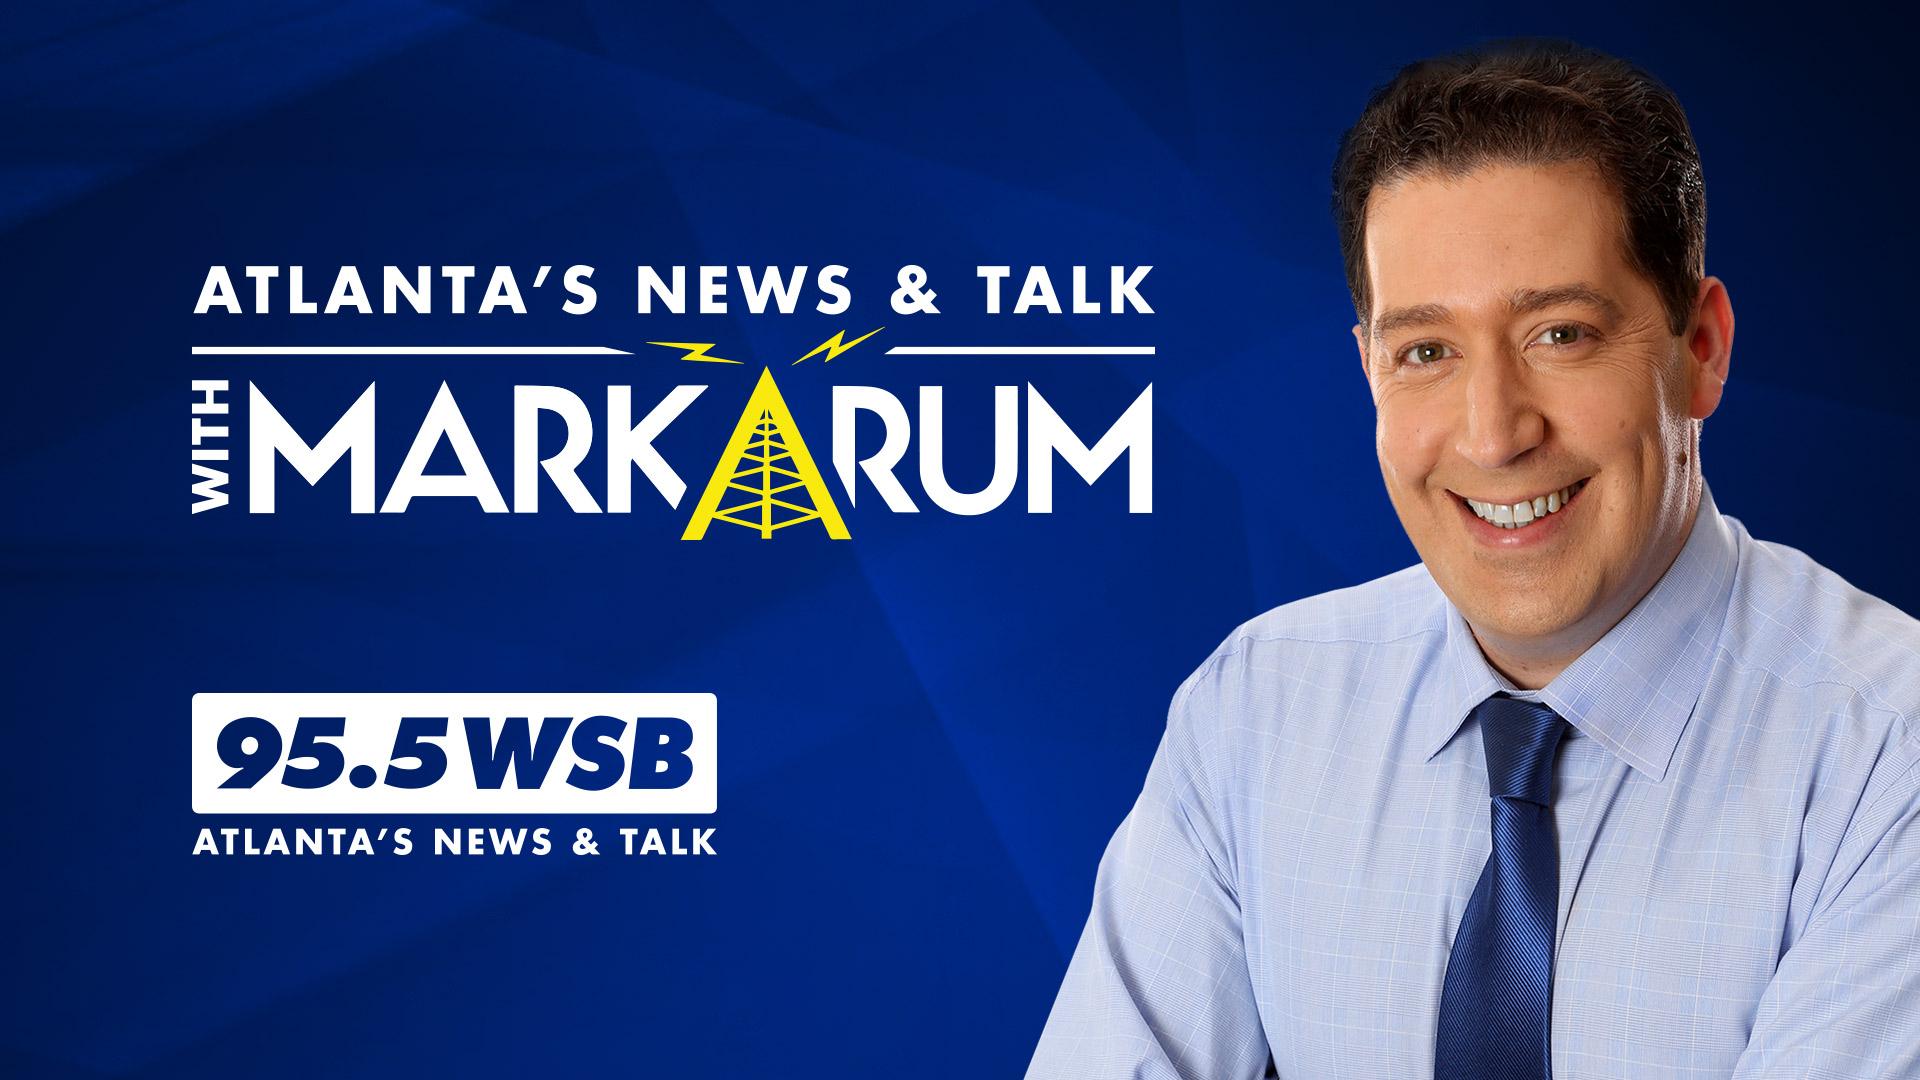 Atlanta's News & Talk with Mark Arum